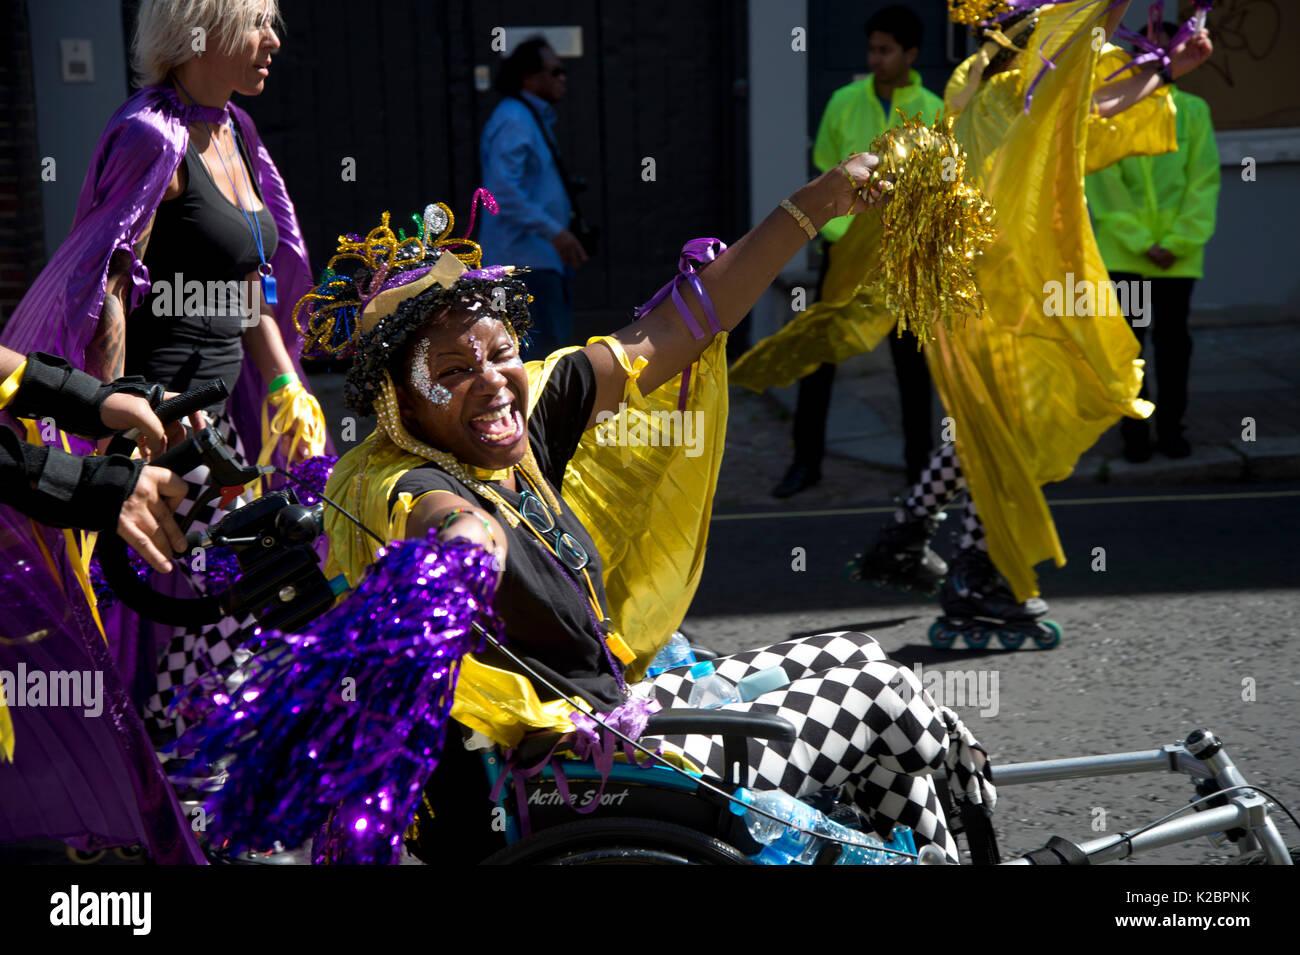 Notting Hill Carnival August  2017. A carnival reveller dances in her wheelchair, alongside a group of roller bladers. - Stock Image